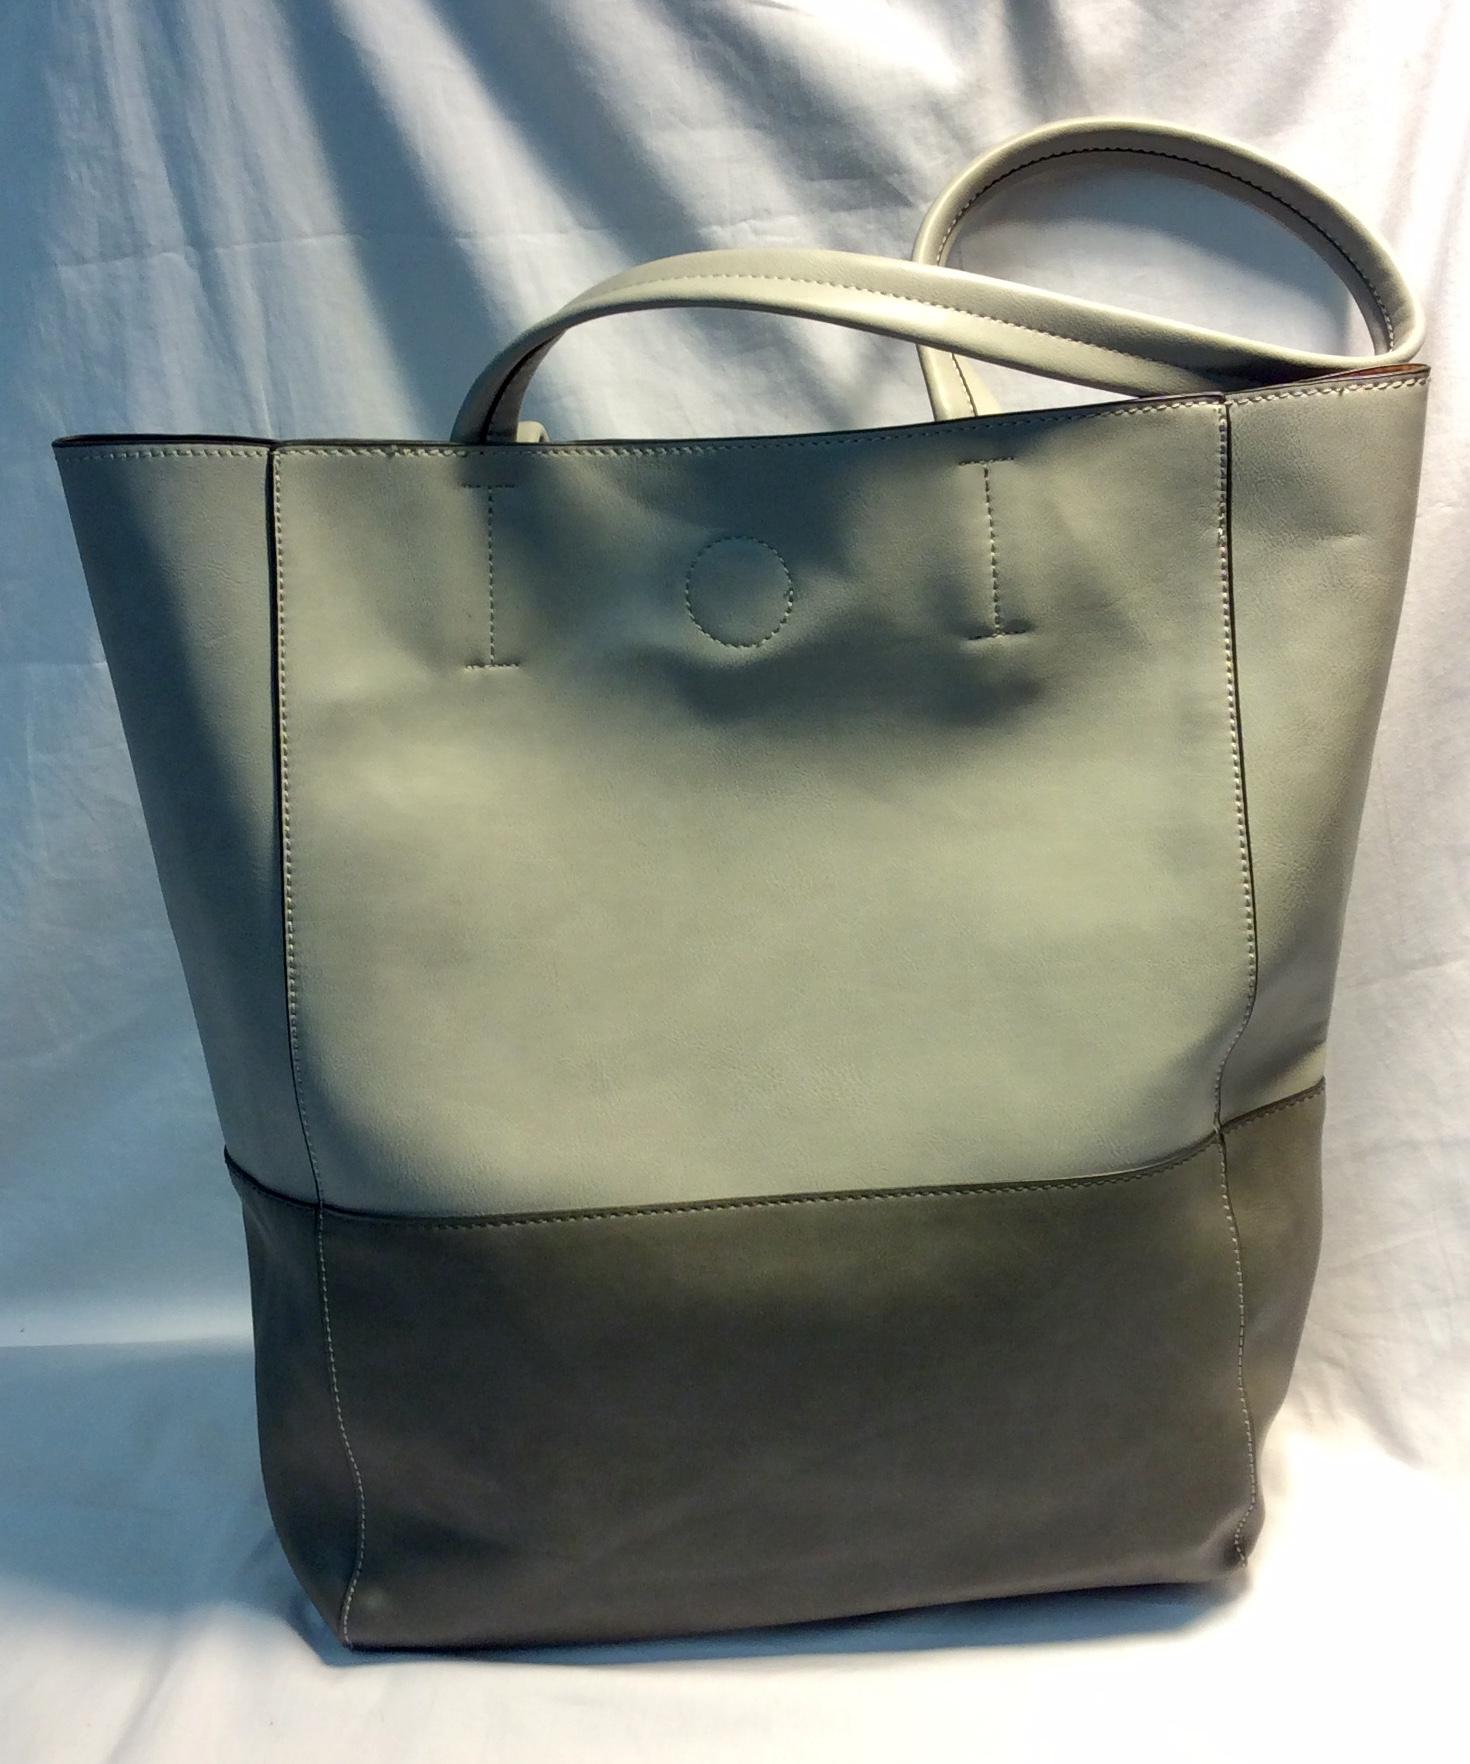 Lily & Ivy Light grey leather purse